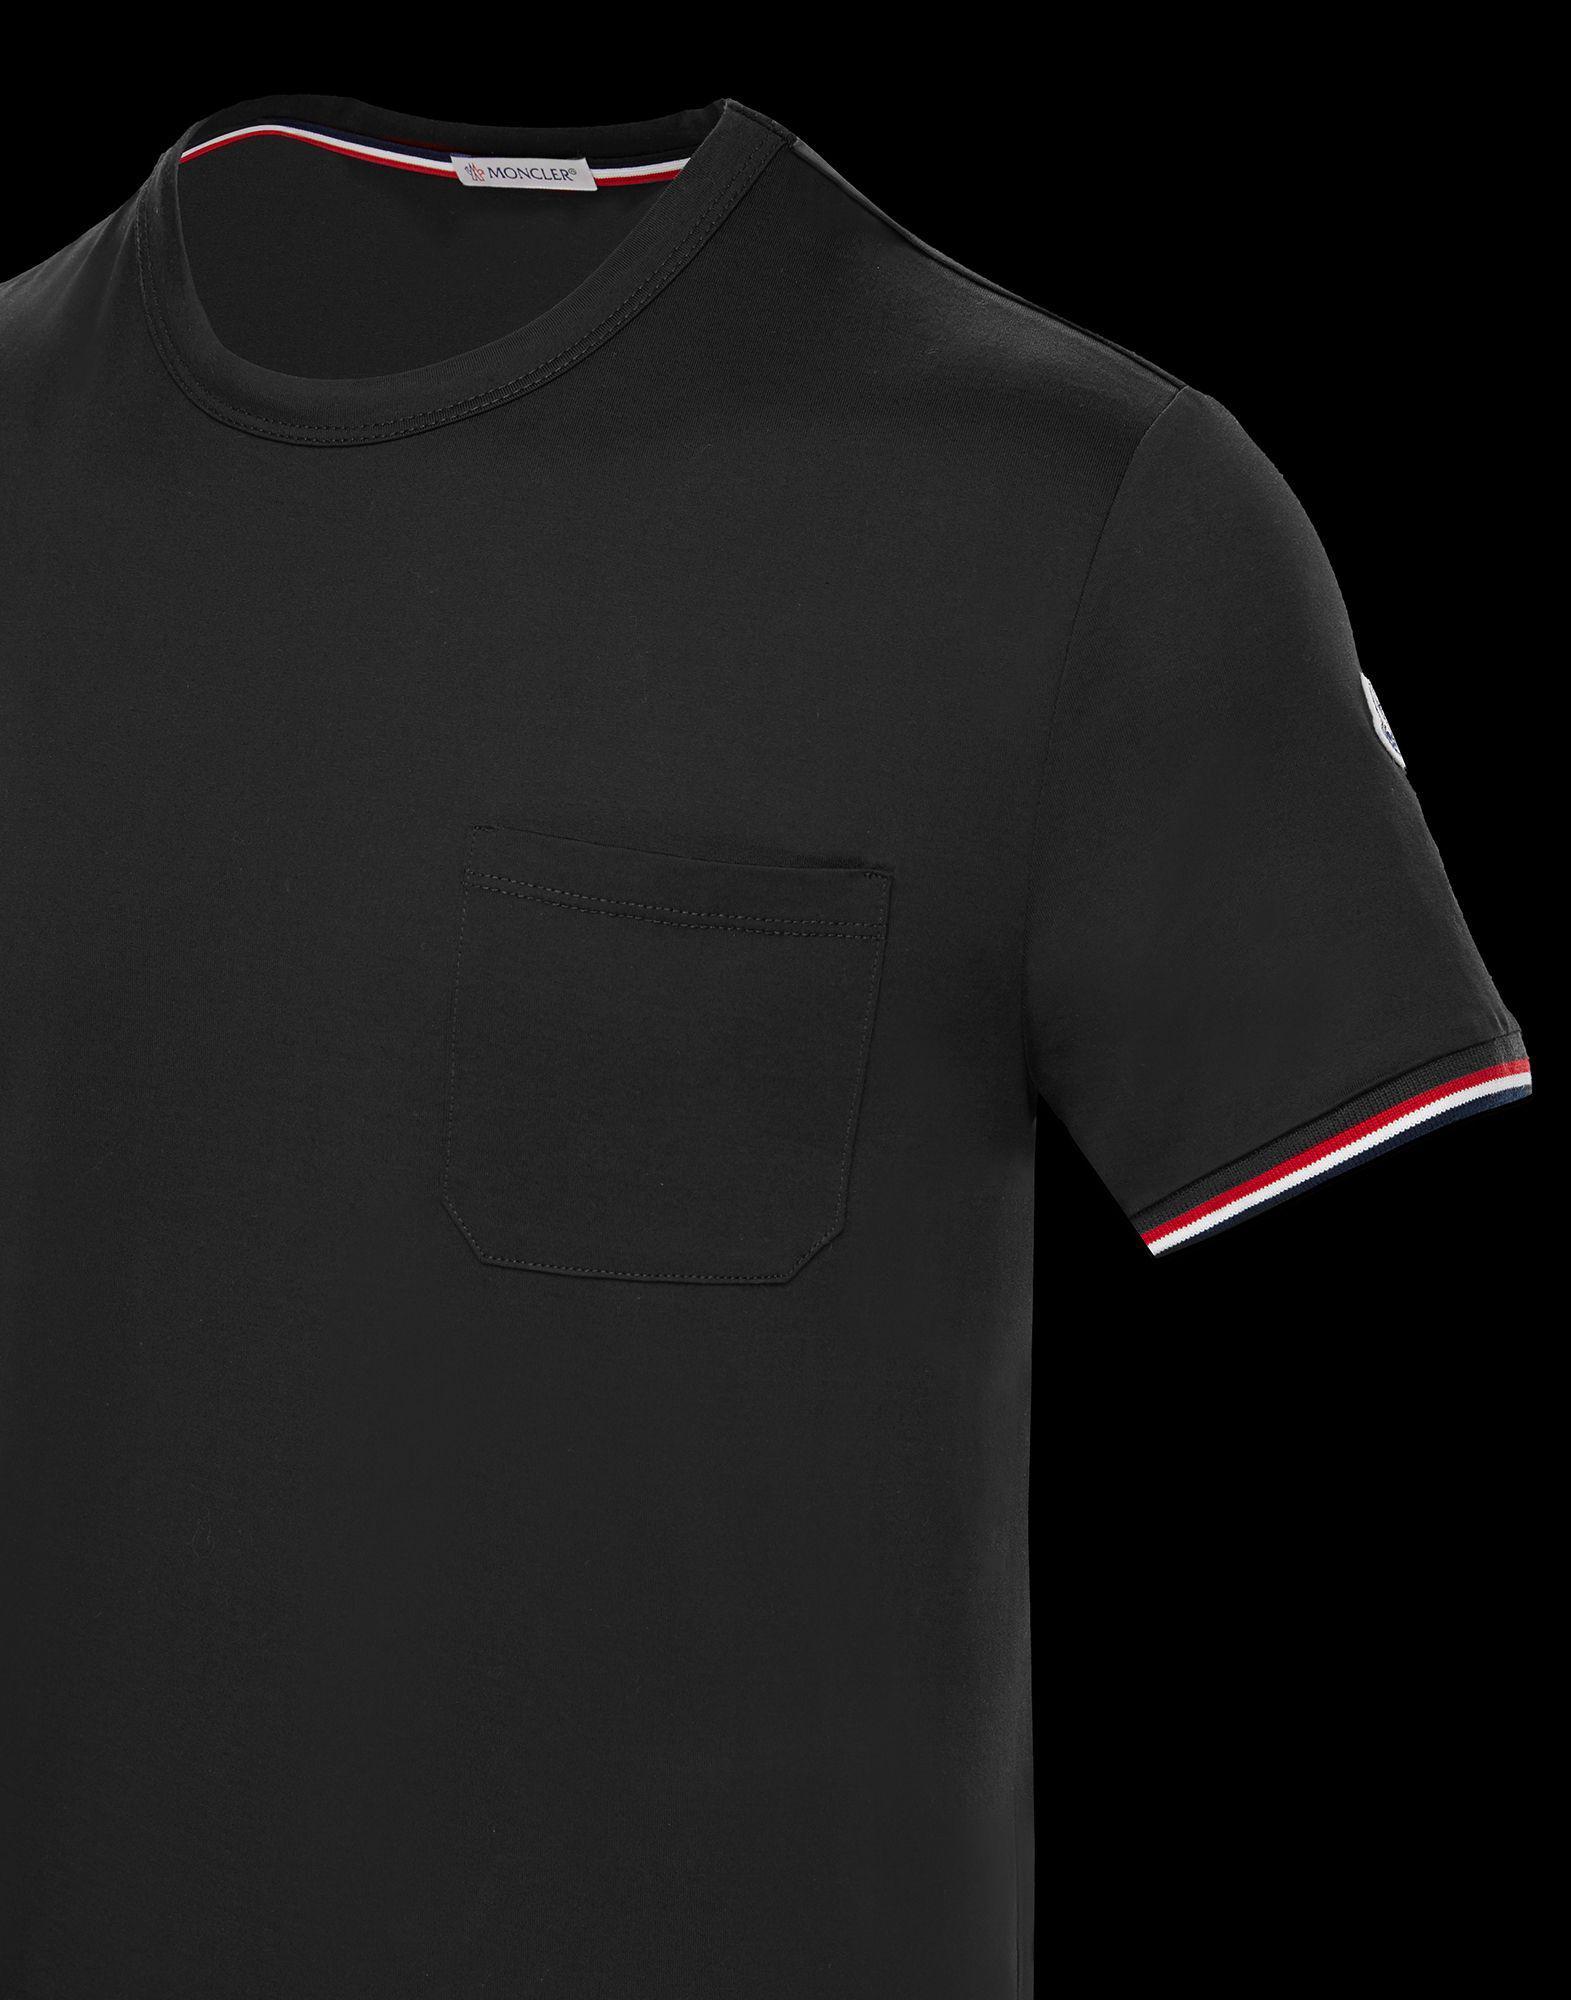 eec9f63b5 Moncler T-shirt in Black for Men - Lyst